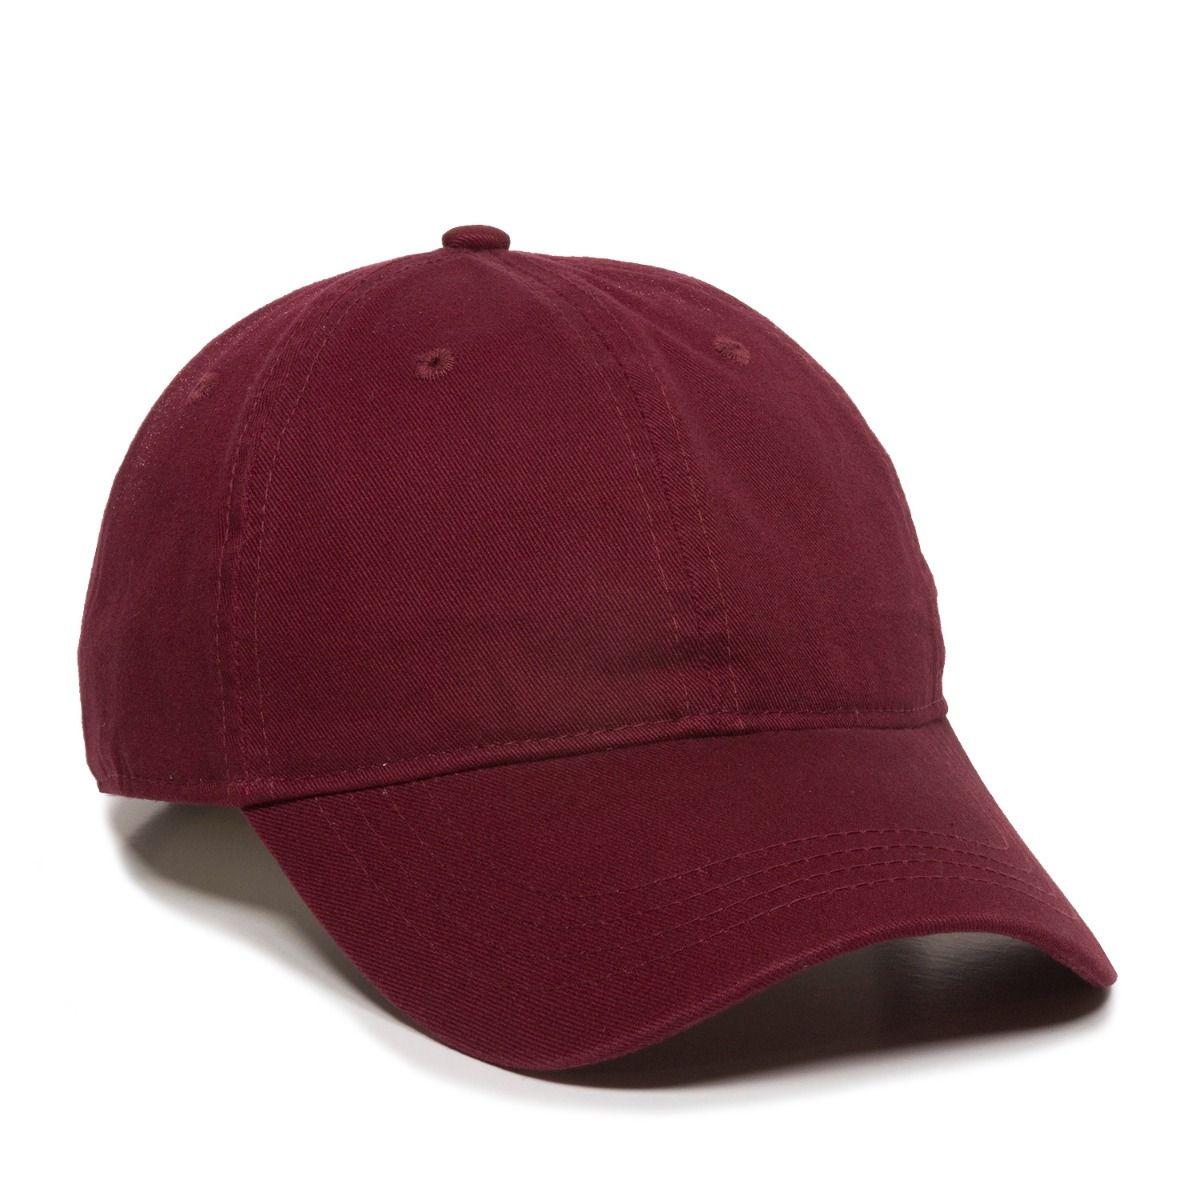 Garment washed Cotton Twill Baseball Hat